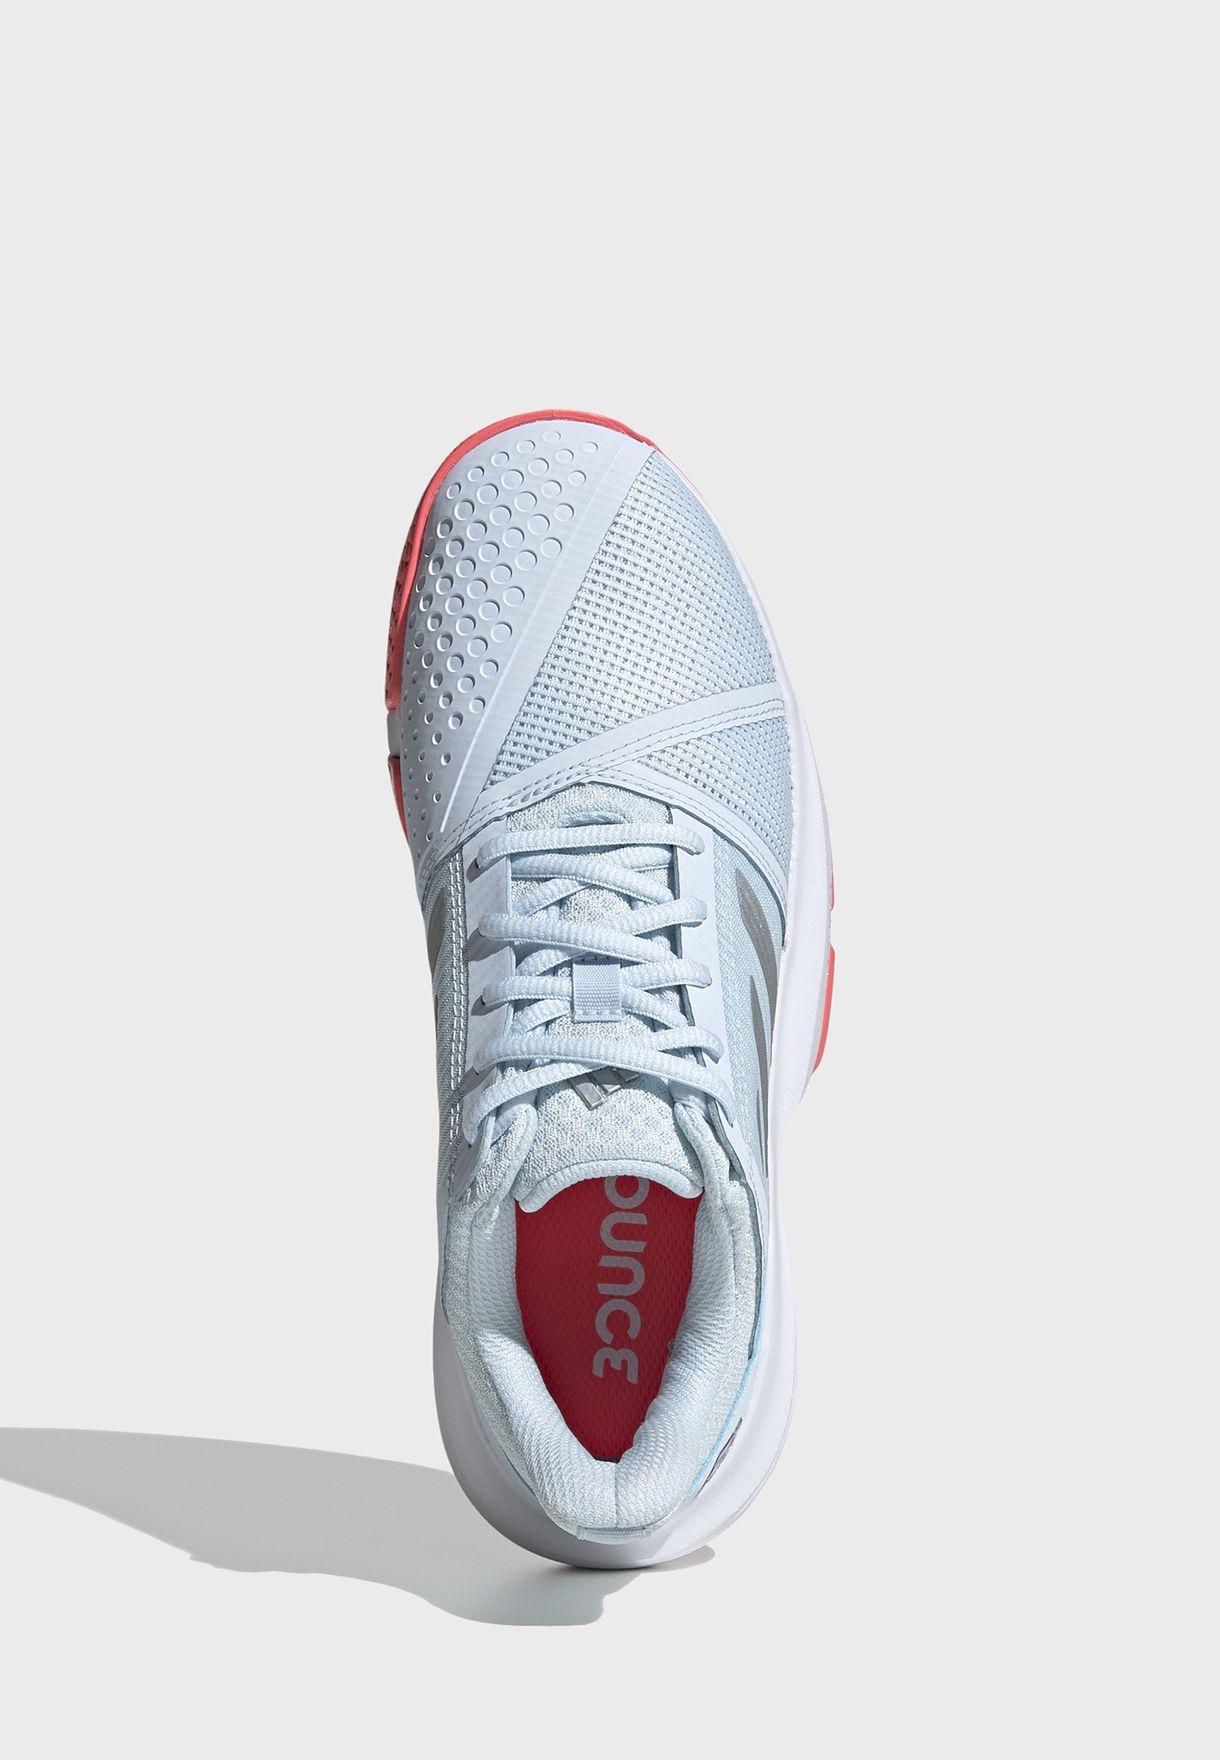 Courtjam Bounce Sports Tennis Women's Shoes